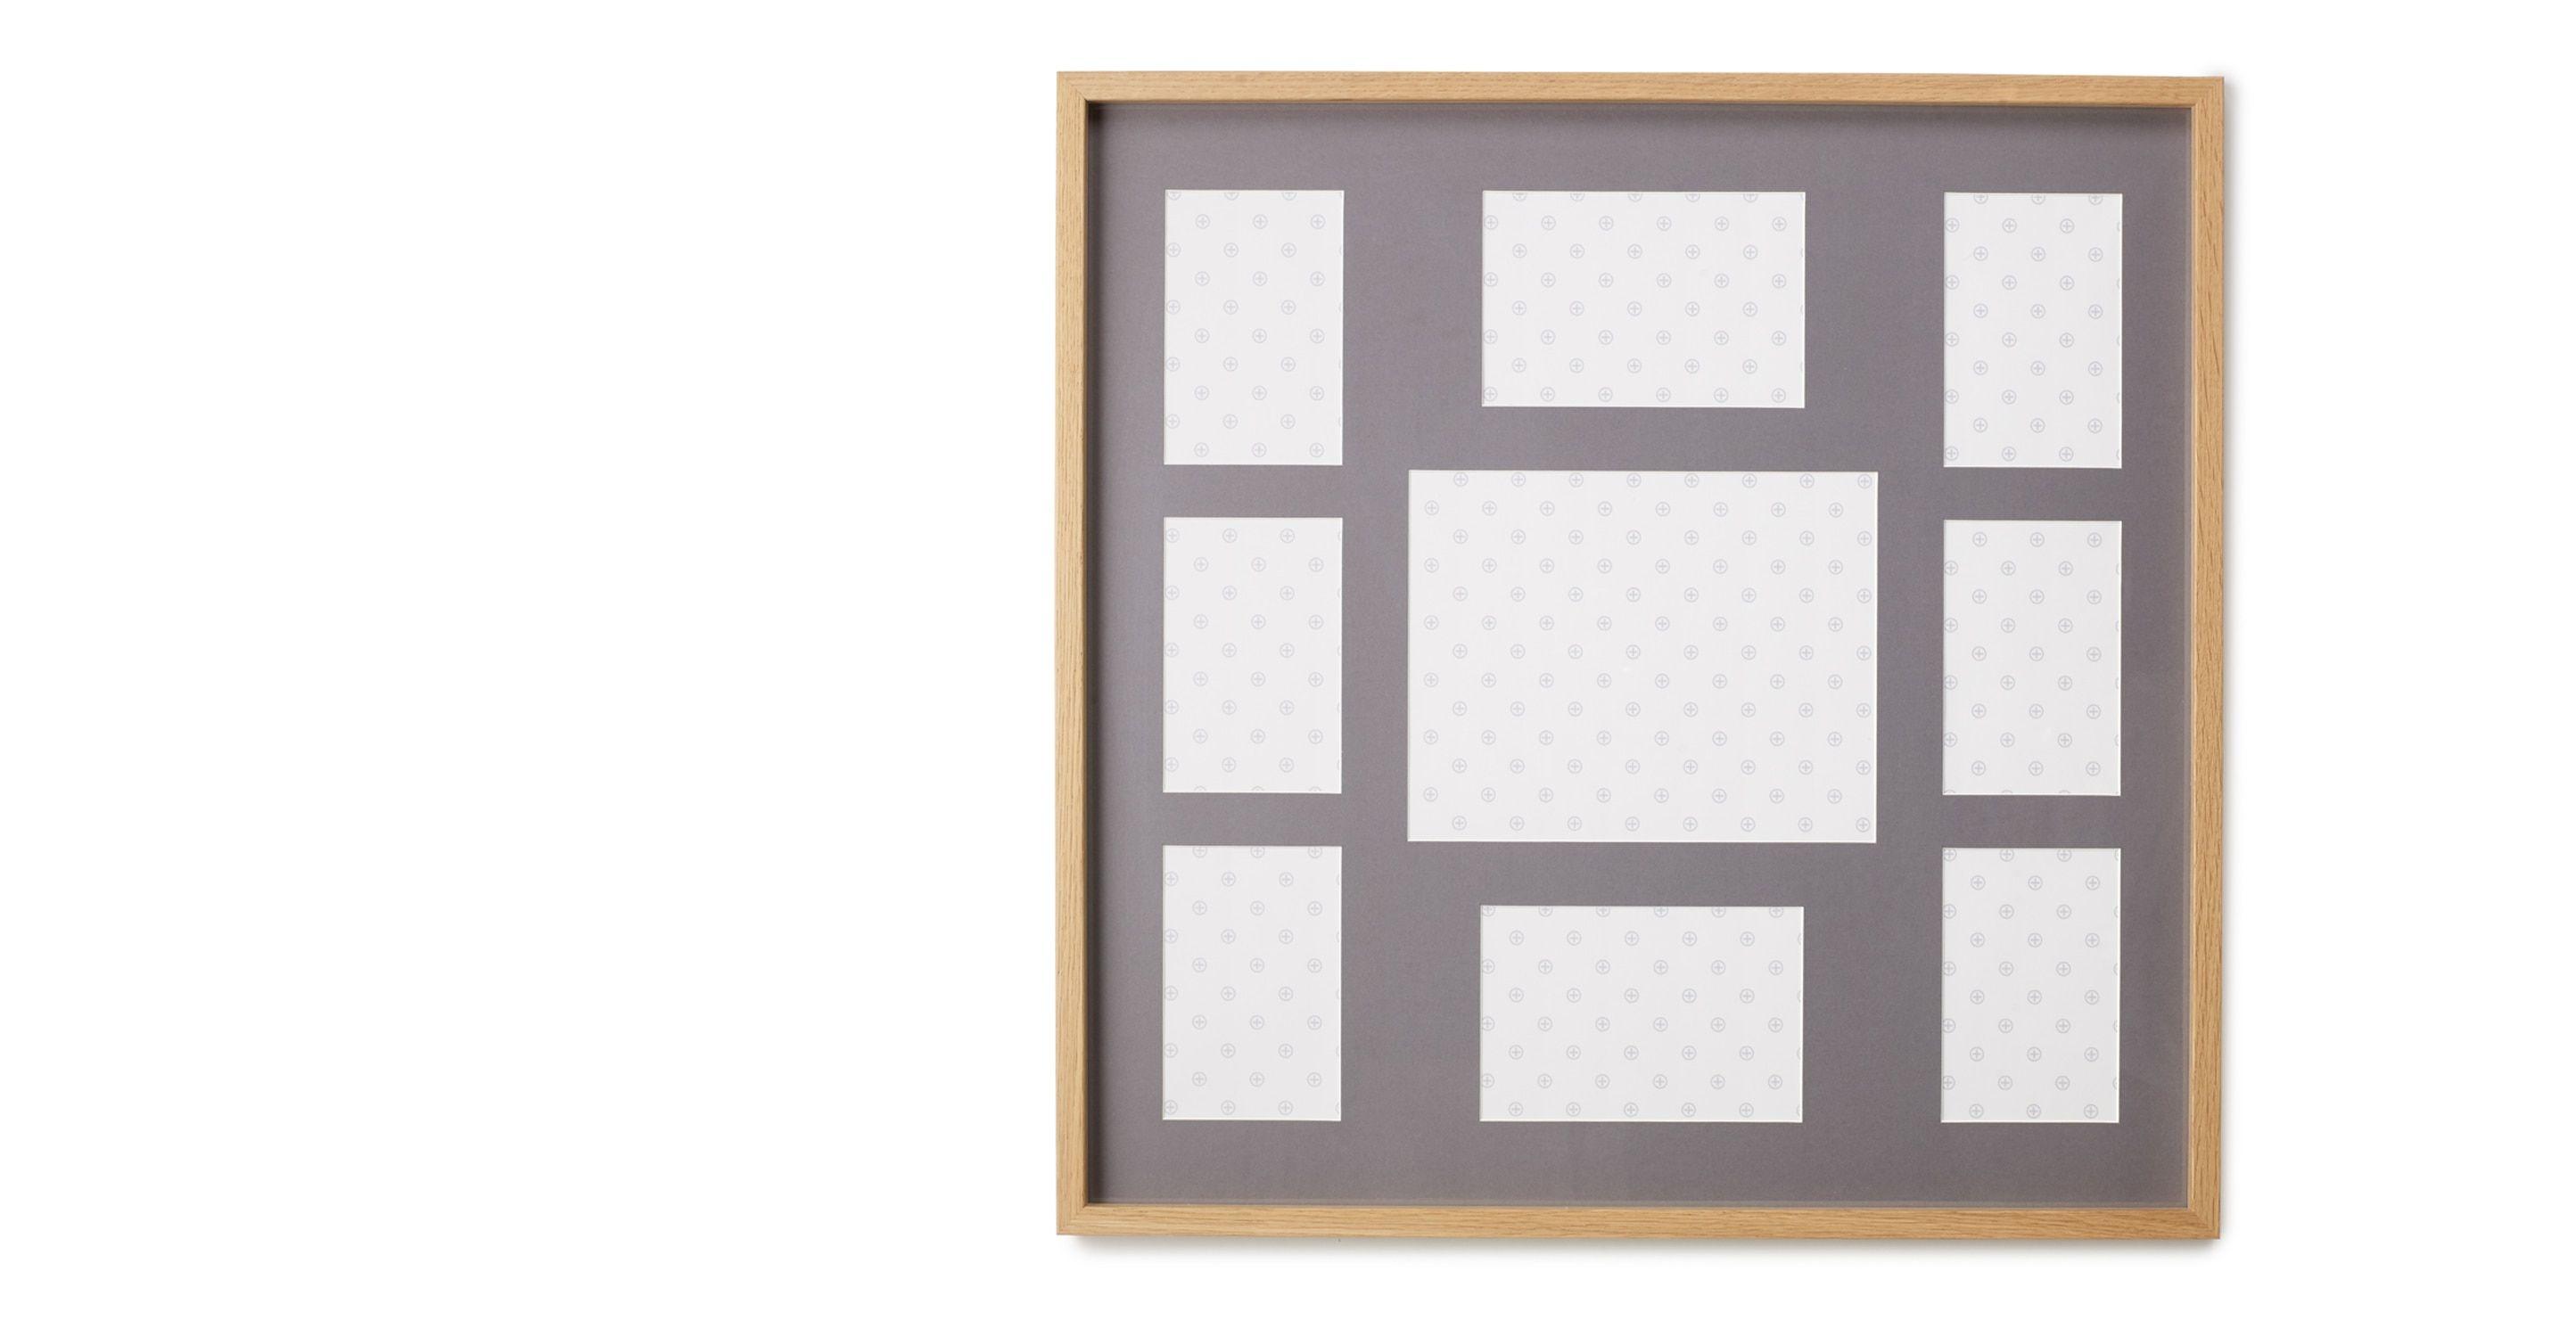 Portland Picture Frame 9 Aperture 58 x 58 cm Oak w Grey Mount from ...